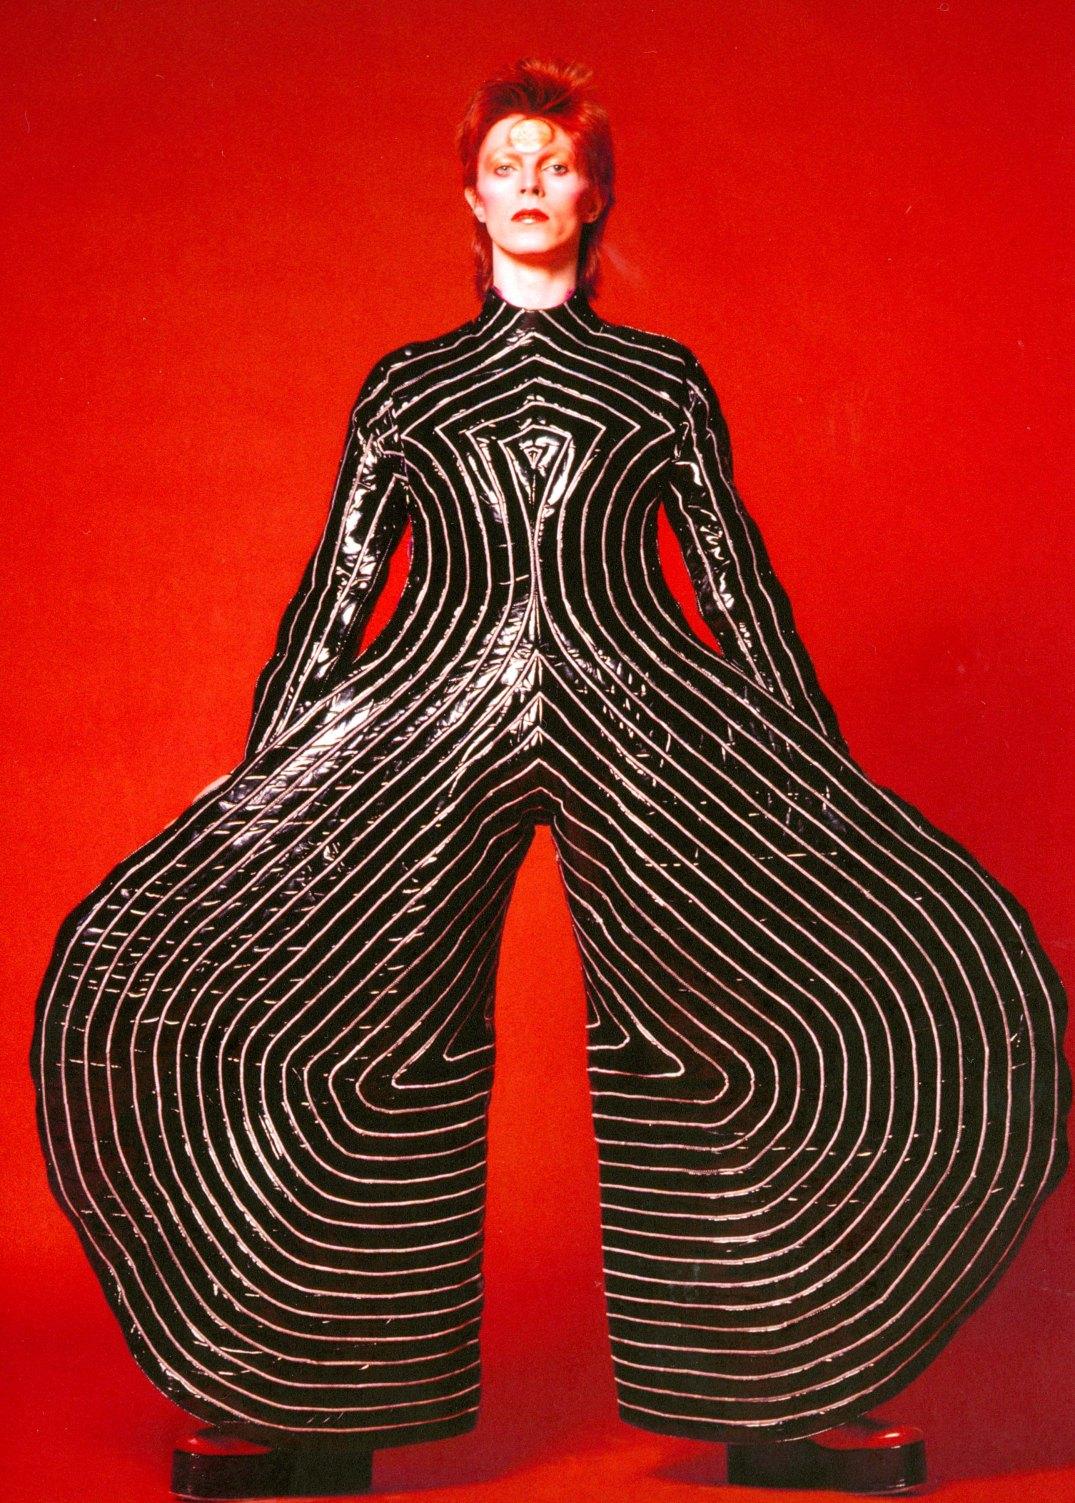 (Photographie de Masayoshi Sukita/ The David Bowie Archive)